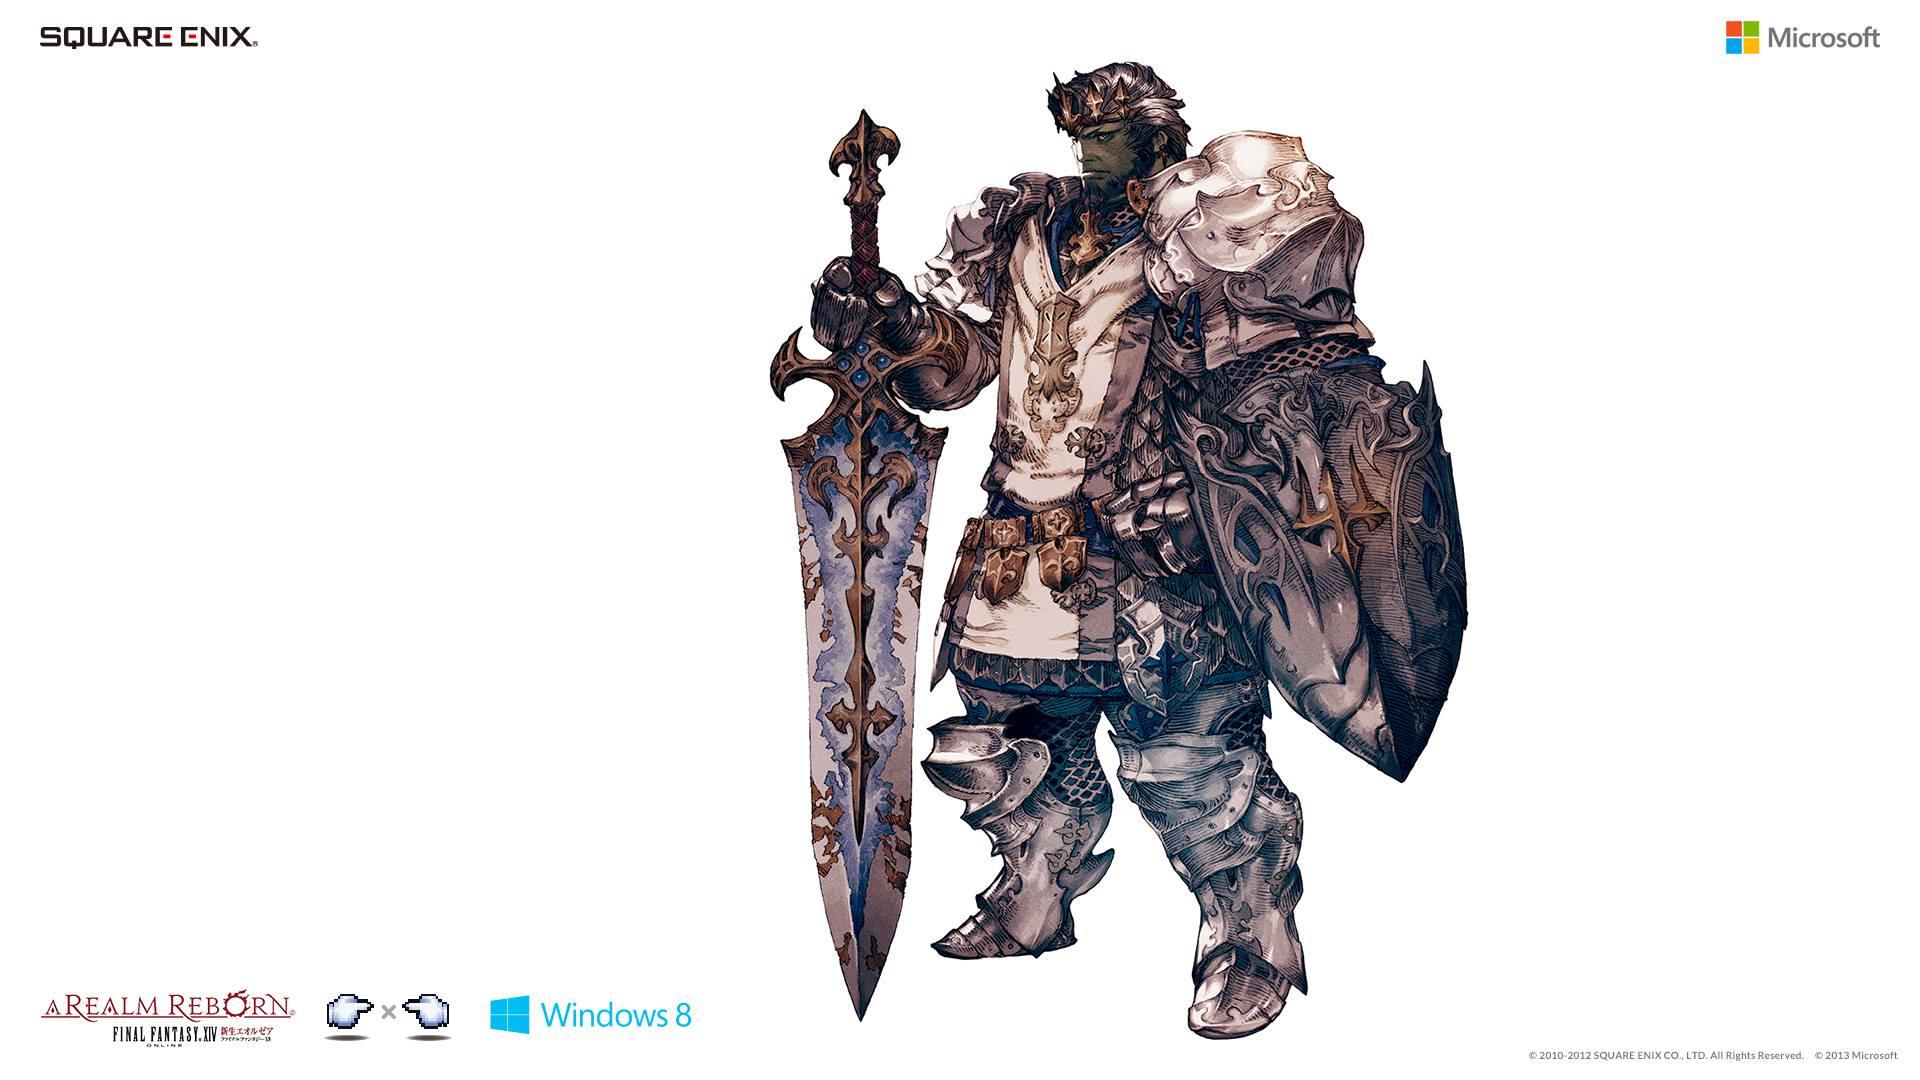 Final Fantasy XIV wallpapers - Final Fantasy Wiki - Wikia